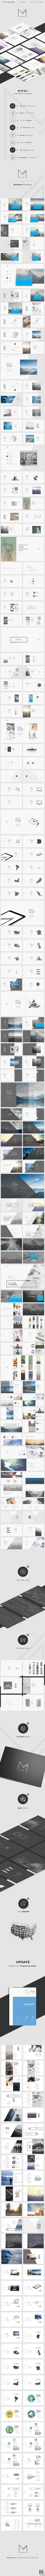 MNML Powerpoint - PowerPoint Templates Presentation Templates